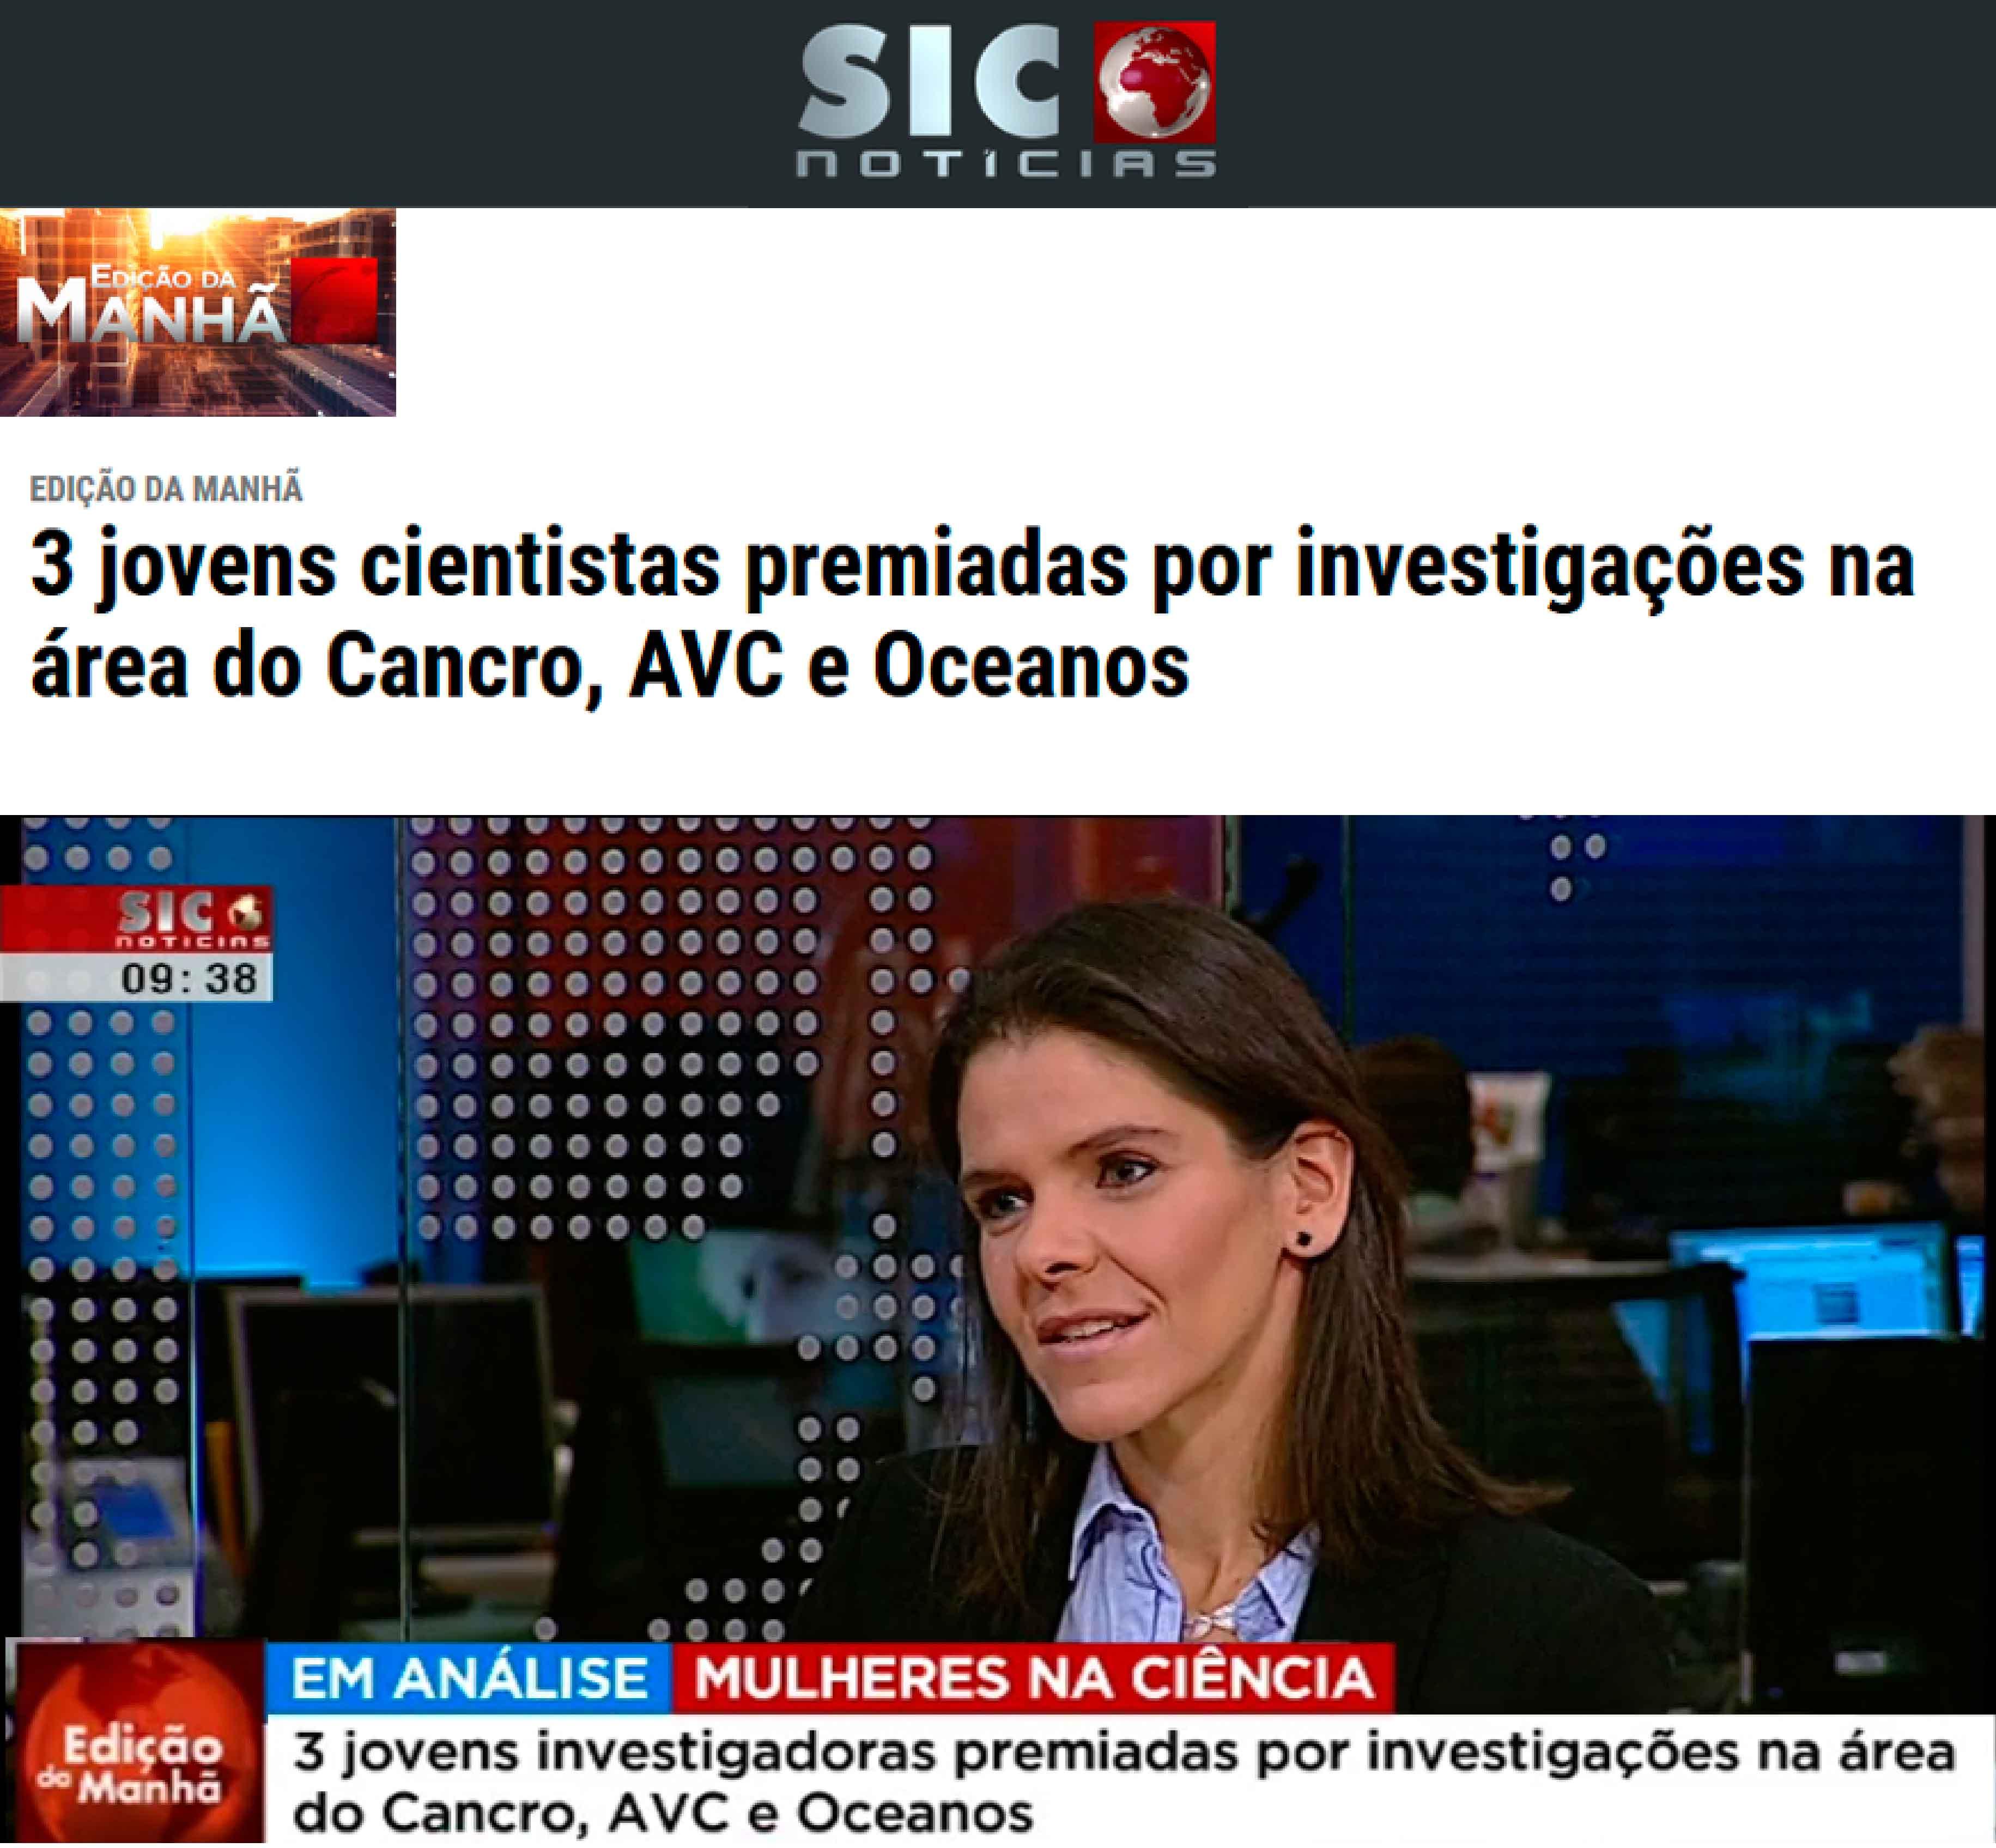 SIC Notícias morning show